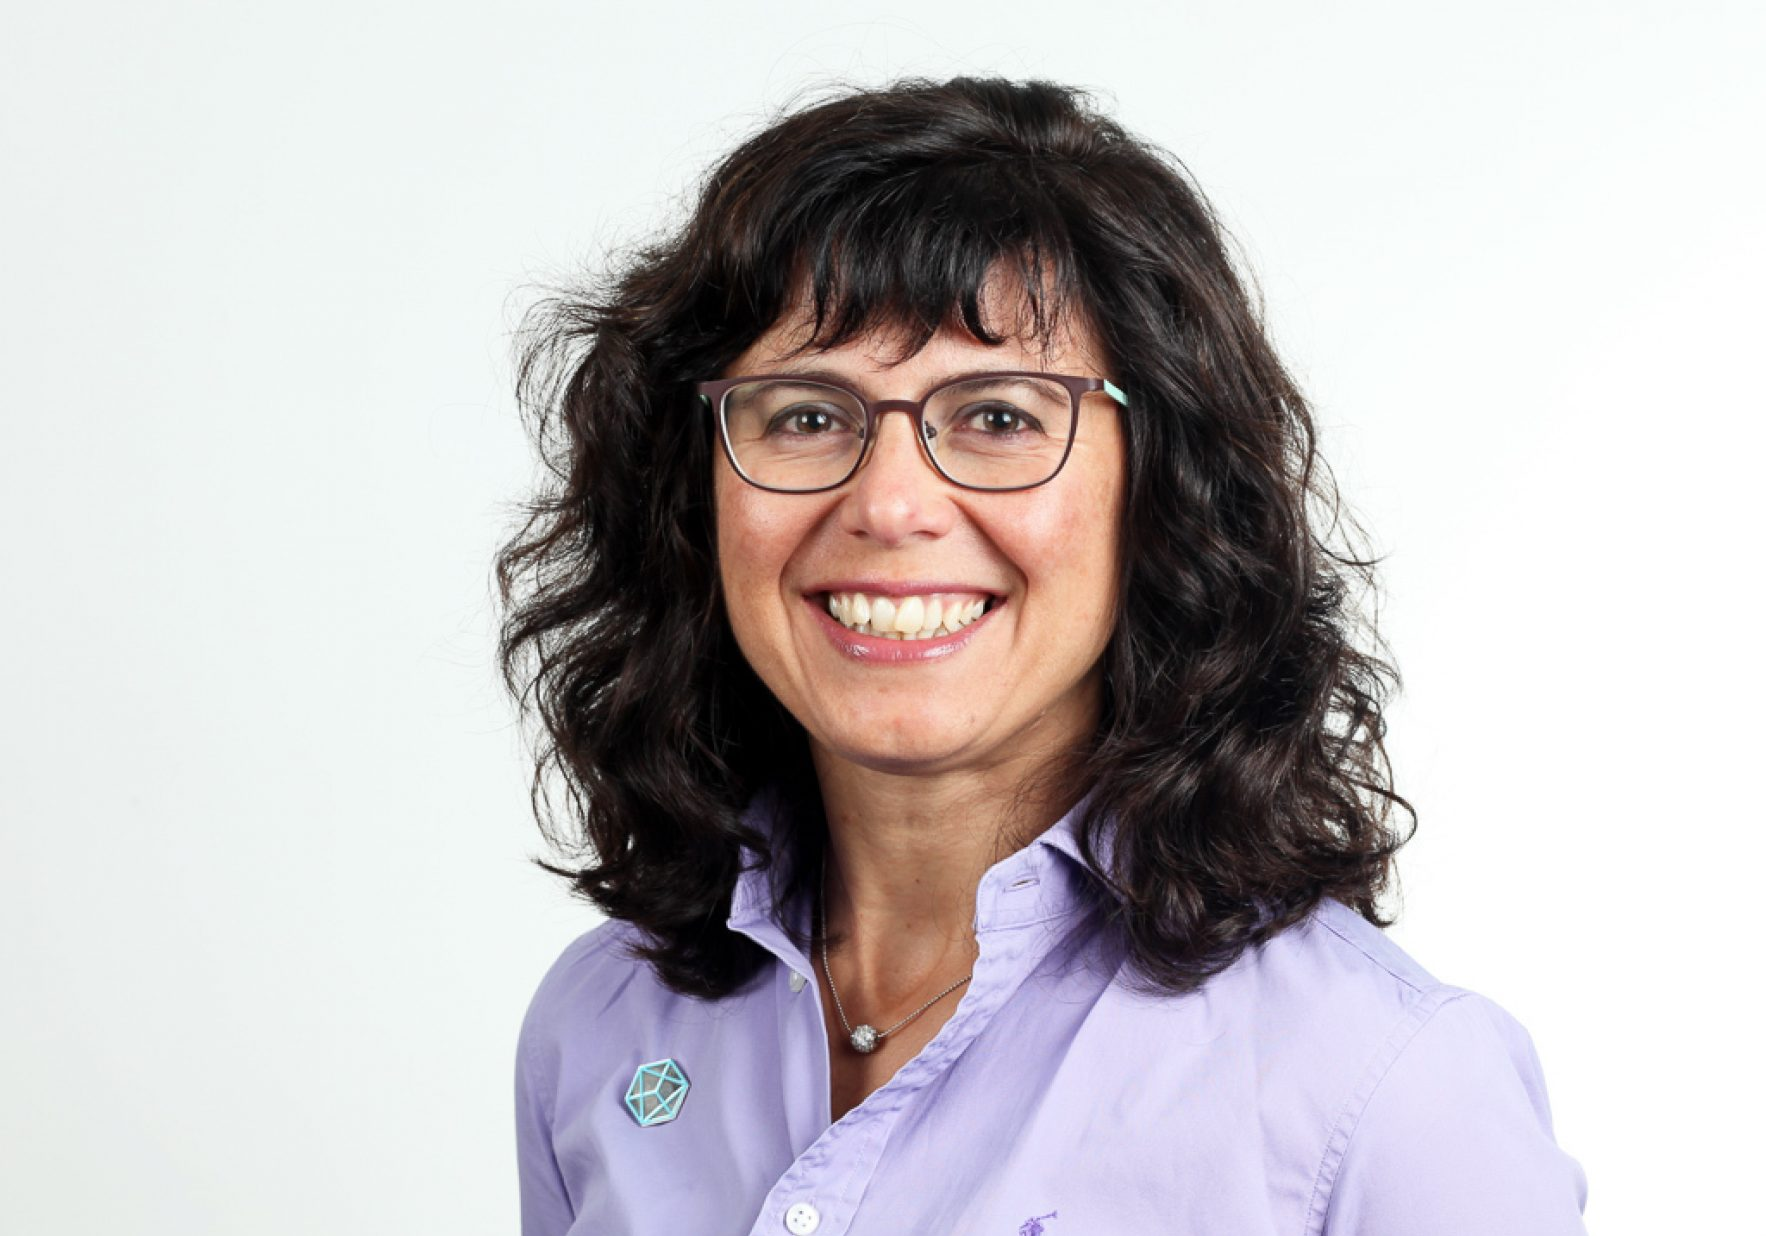 Giovanna Lalli